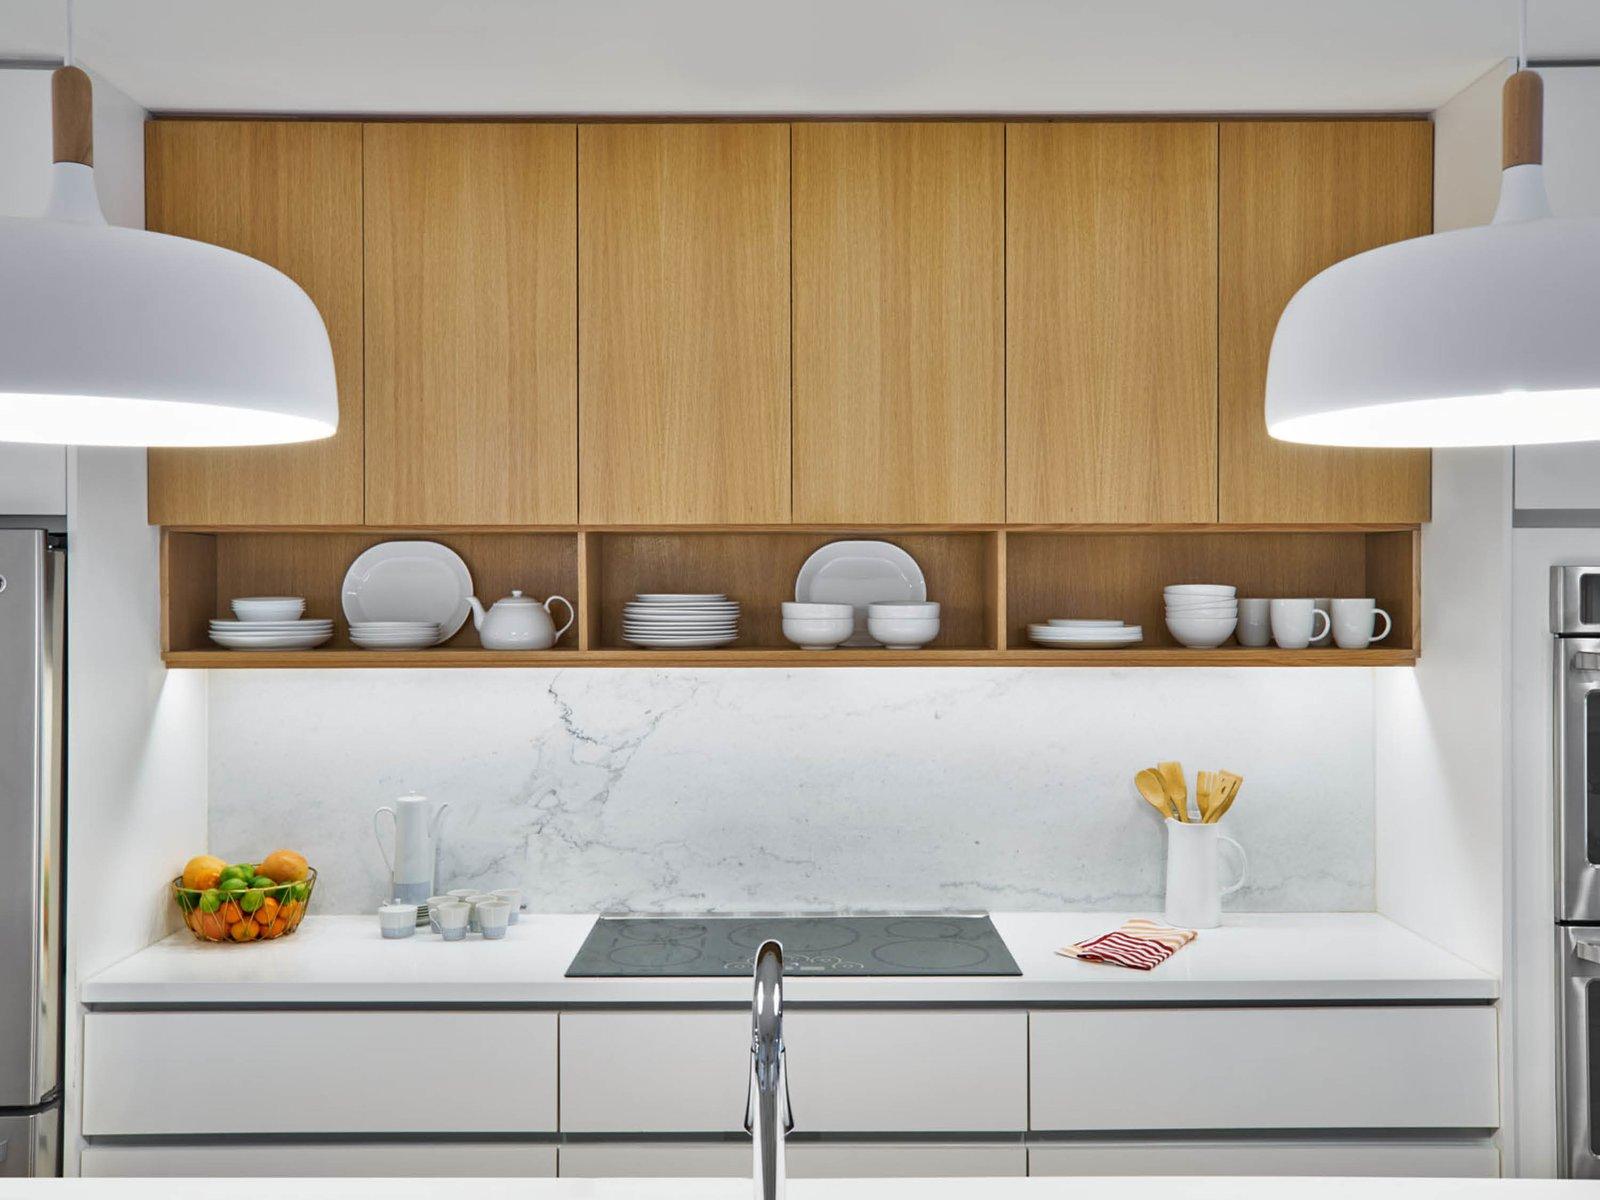 Kitchen, Marble Counter, Wood Cabinet, White Cabinet, Stone Slab Backsplashe, and Pendant Lighting Kitchen  The Historic Ely Building